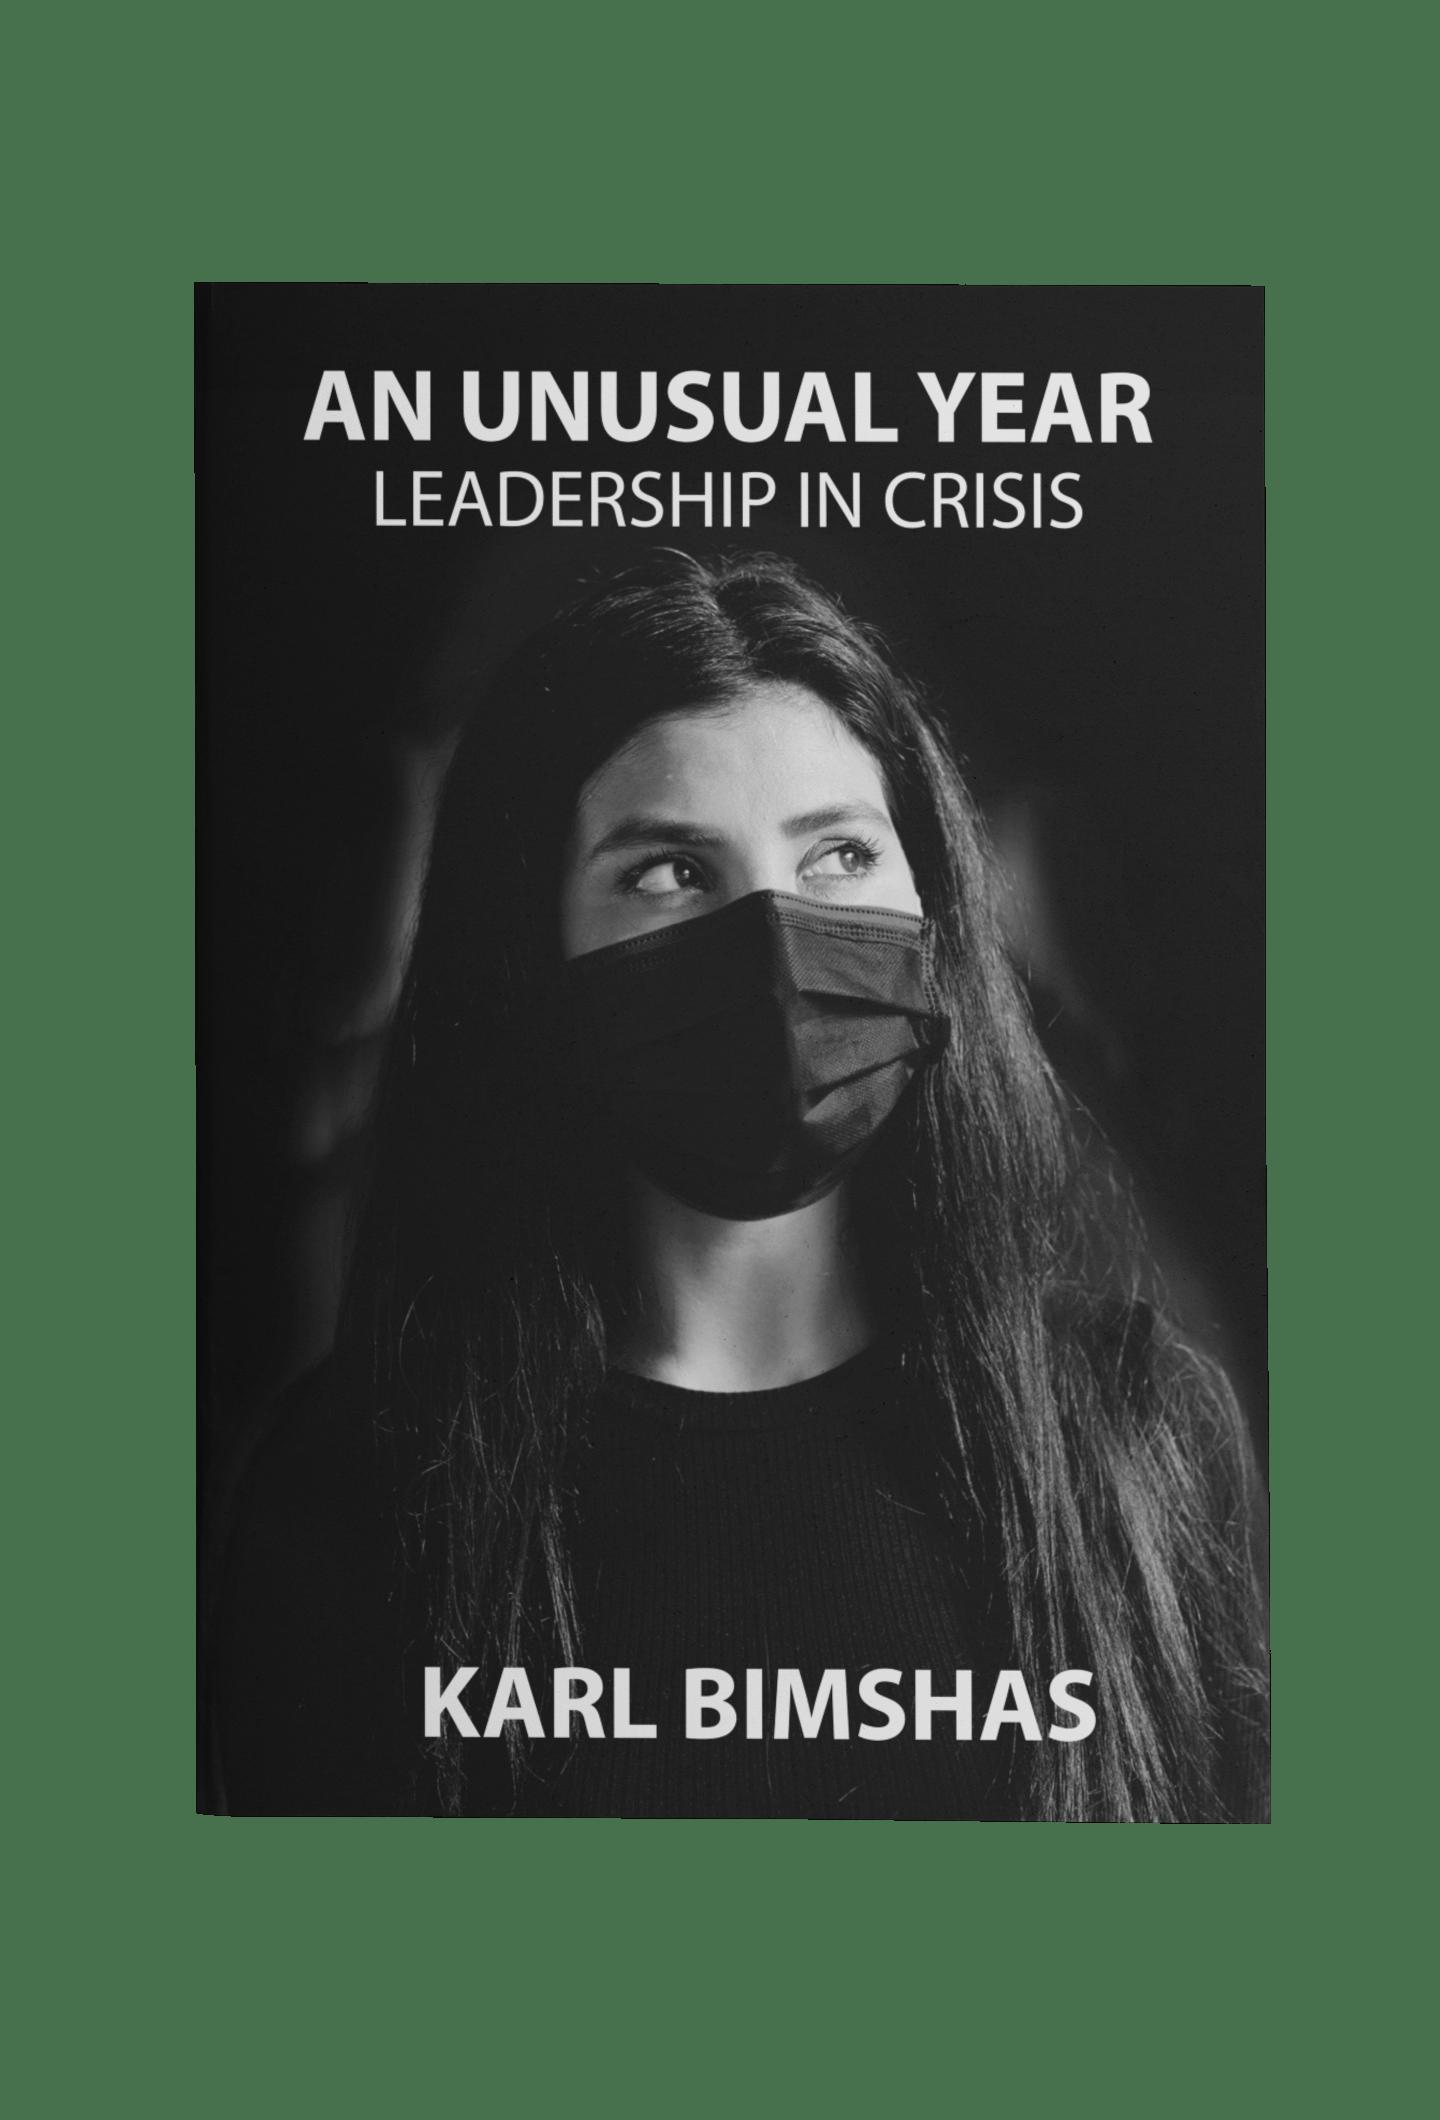 An Unusual Year